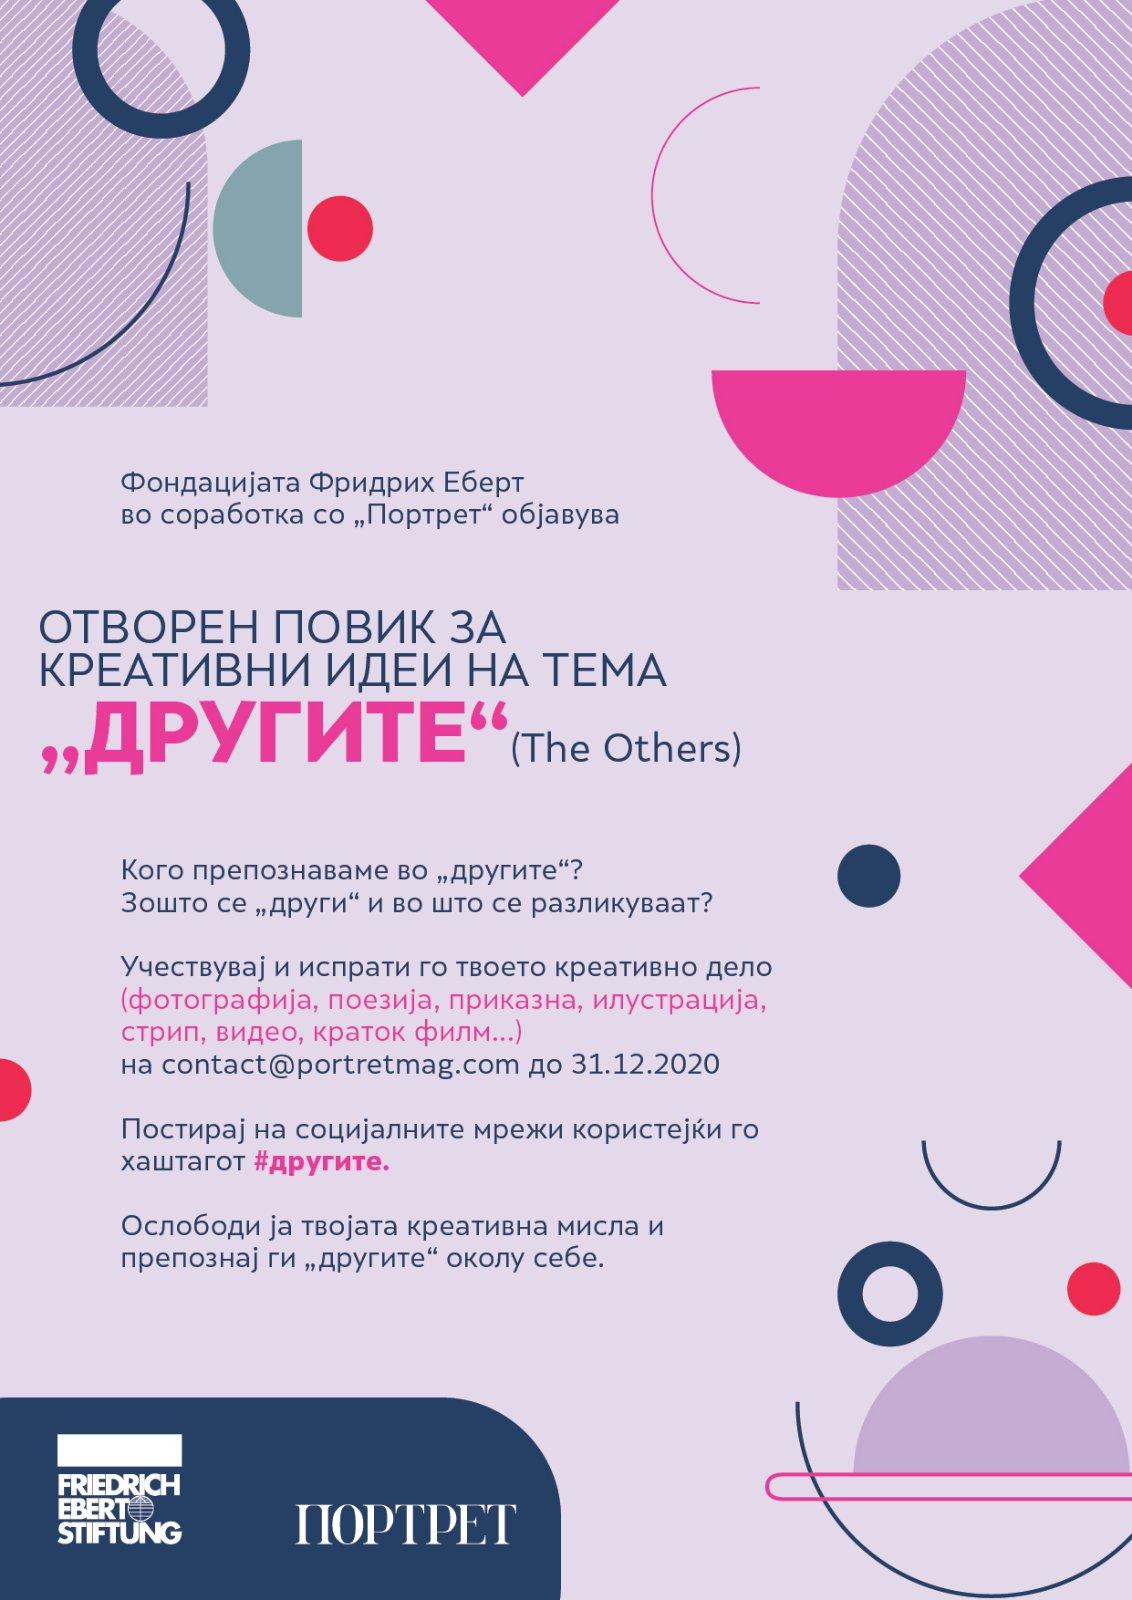 "Отворен повик за креативни дела на тема ""Другите"" (Тhe Others)"